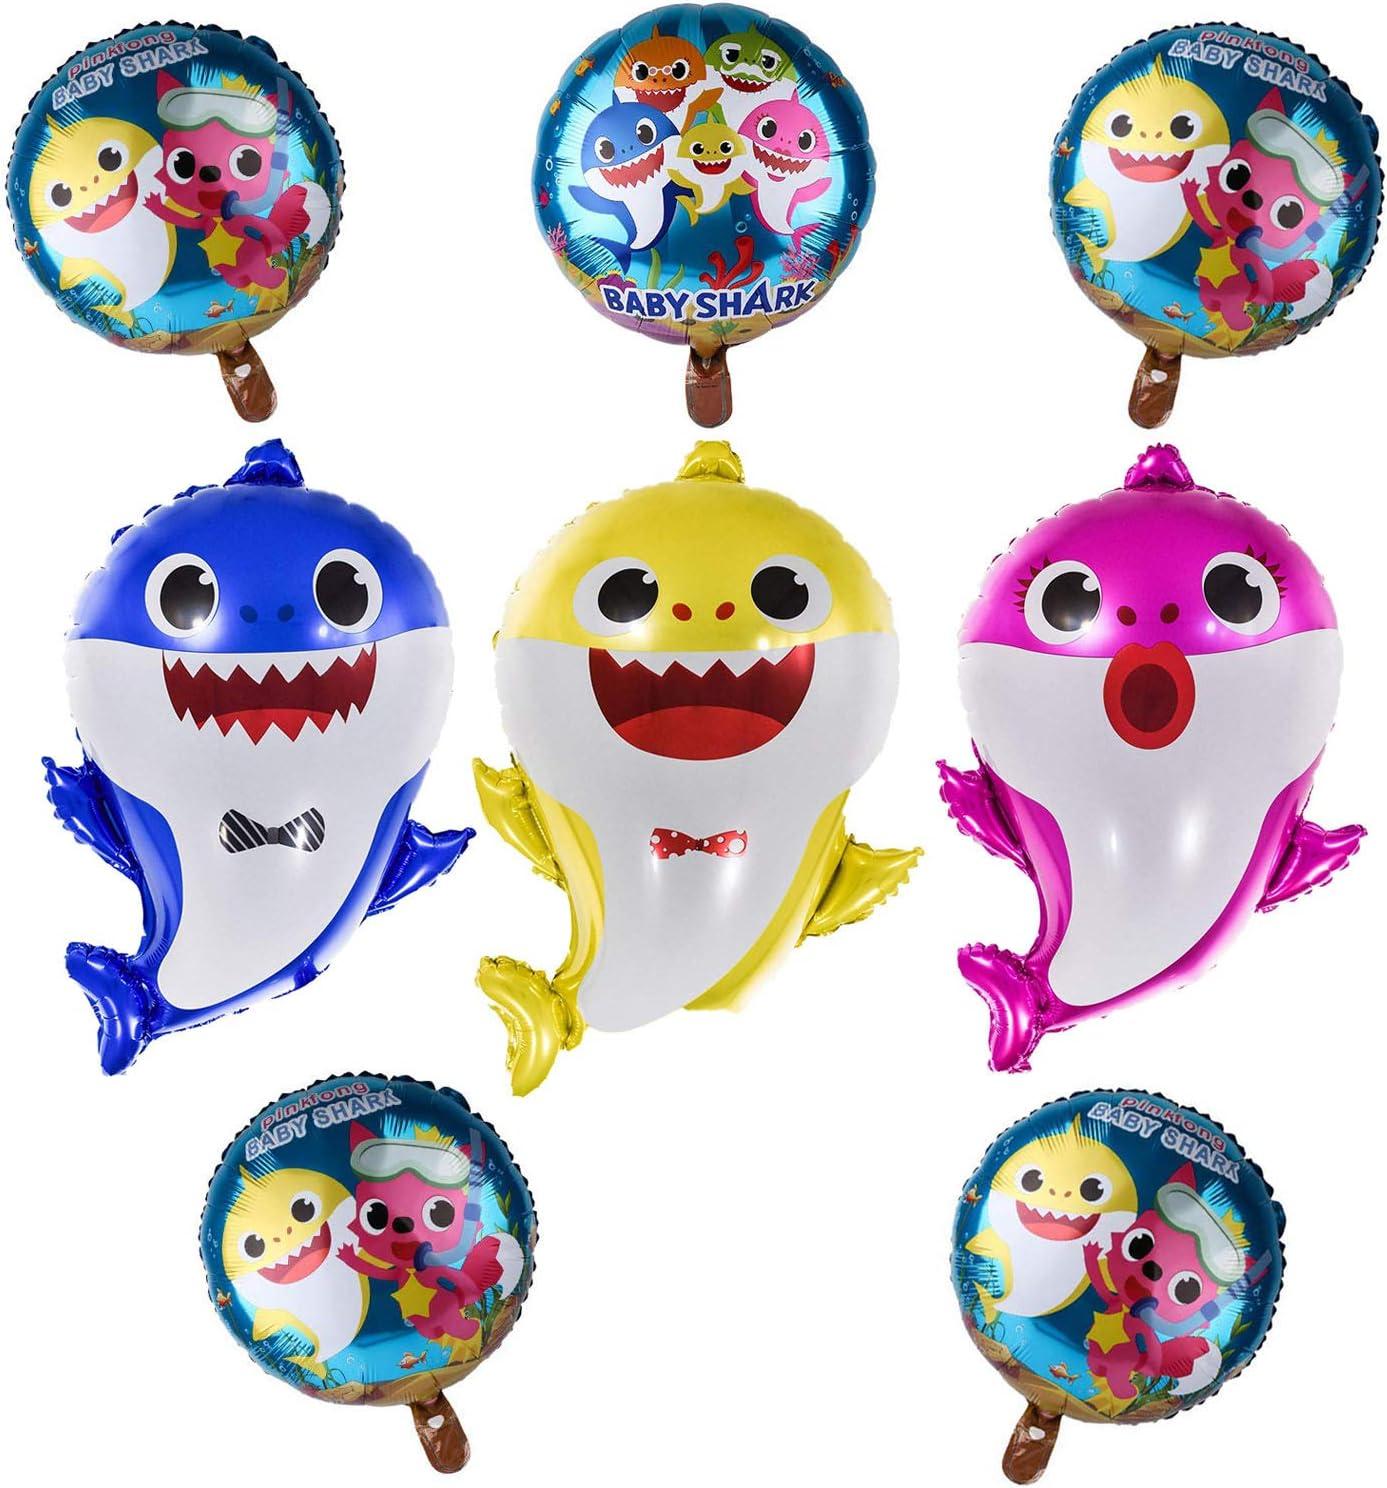 Shark Foil Cute 10pcs Family Balloons Kids Birthday Party Decorations.